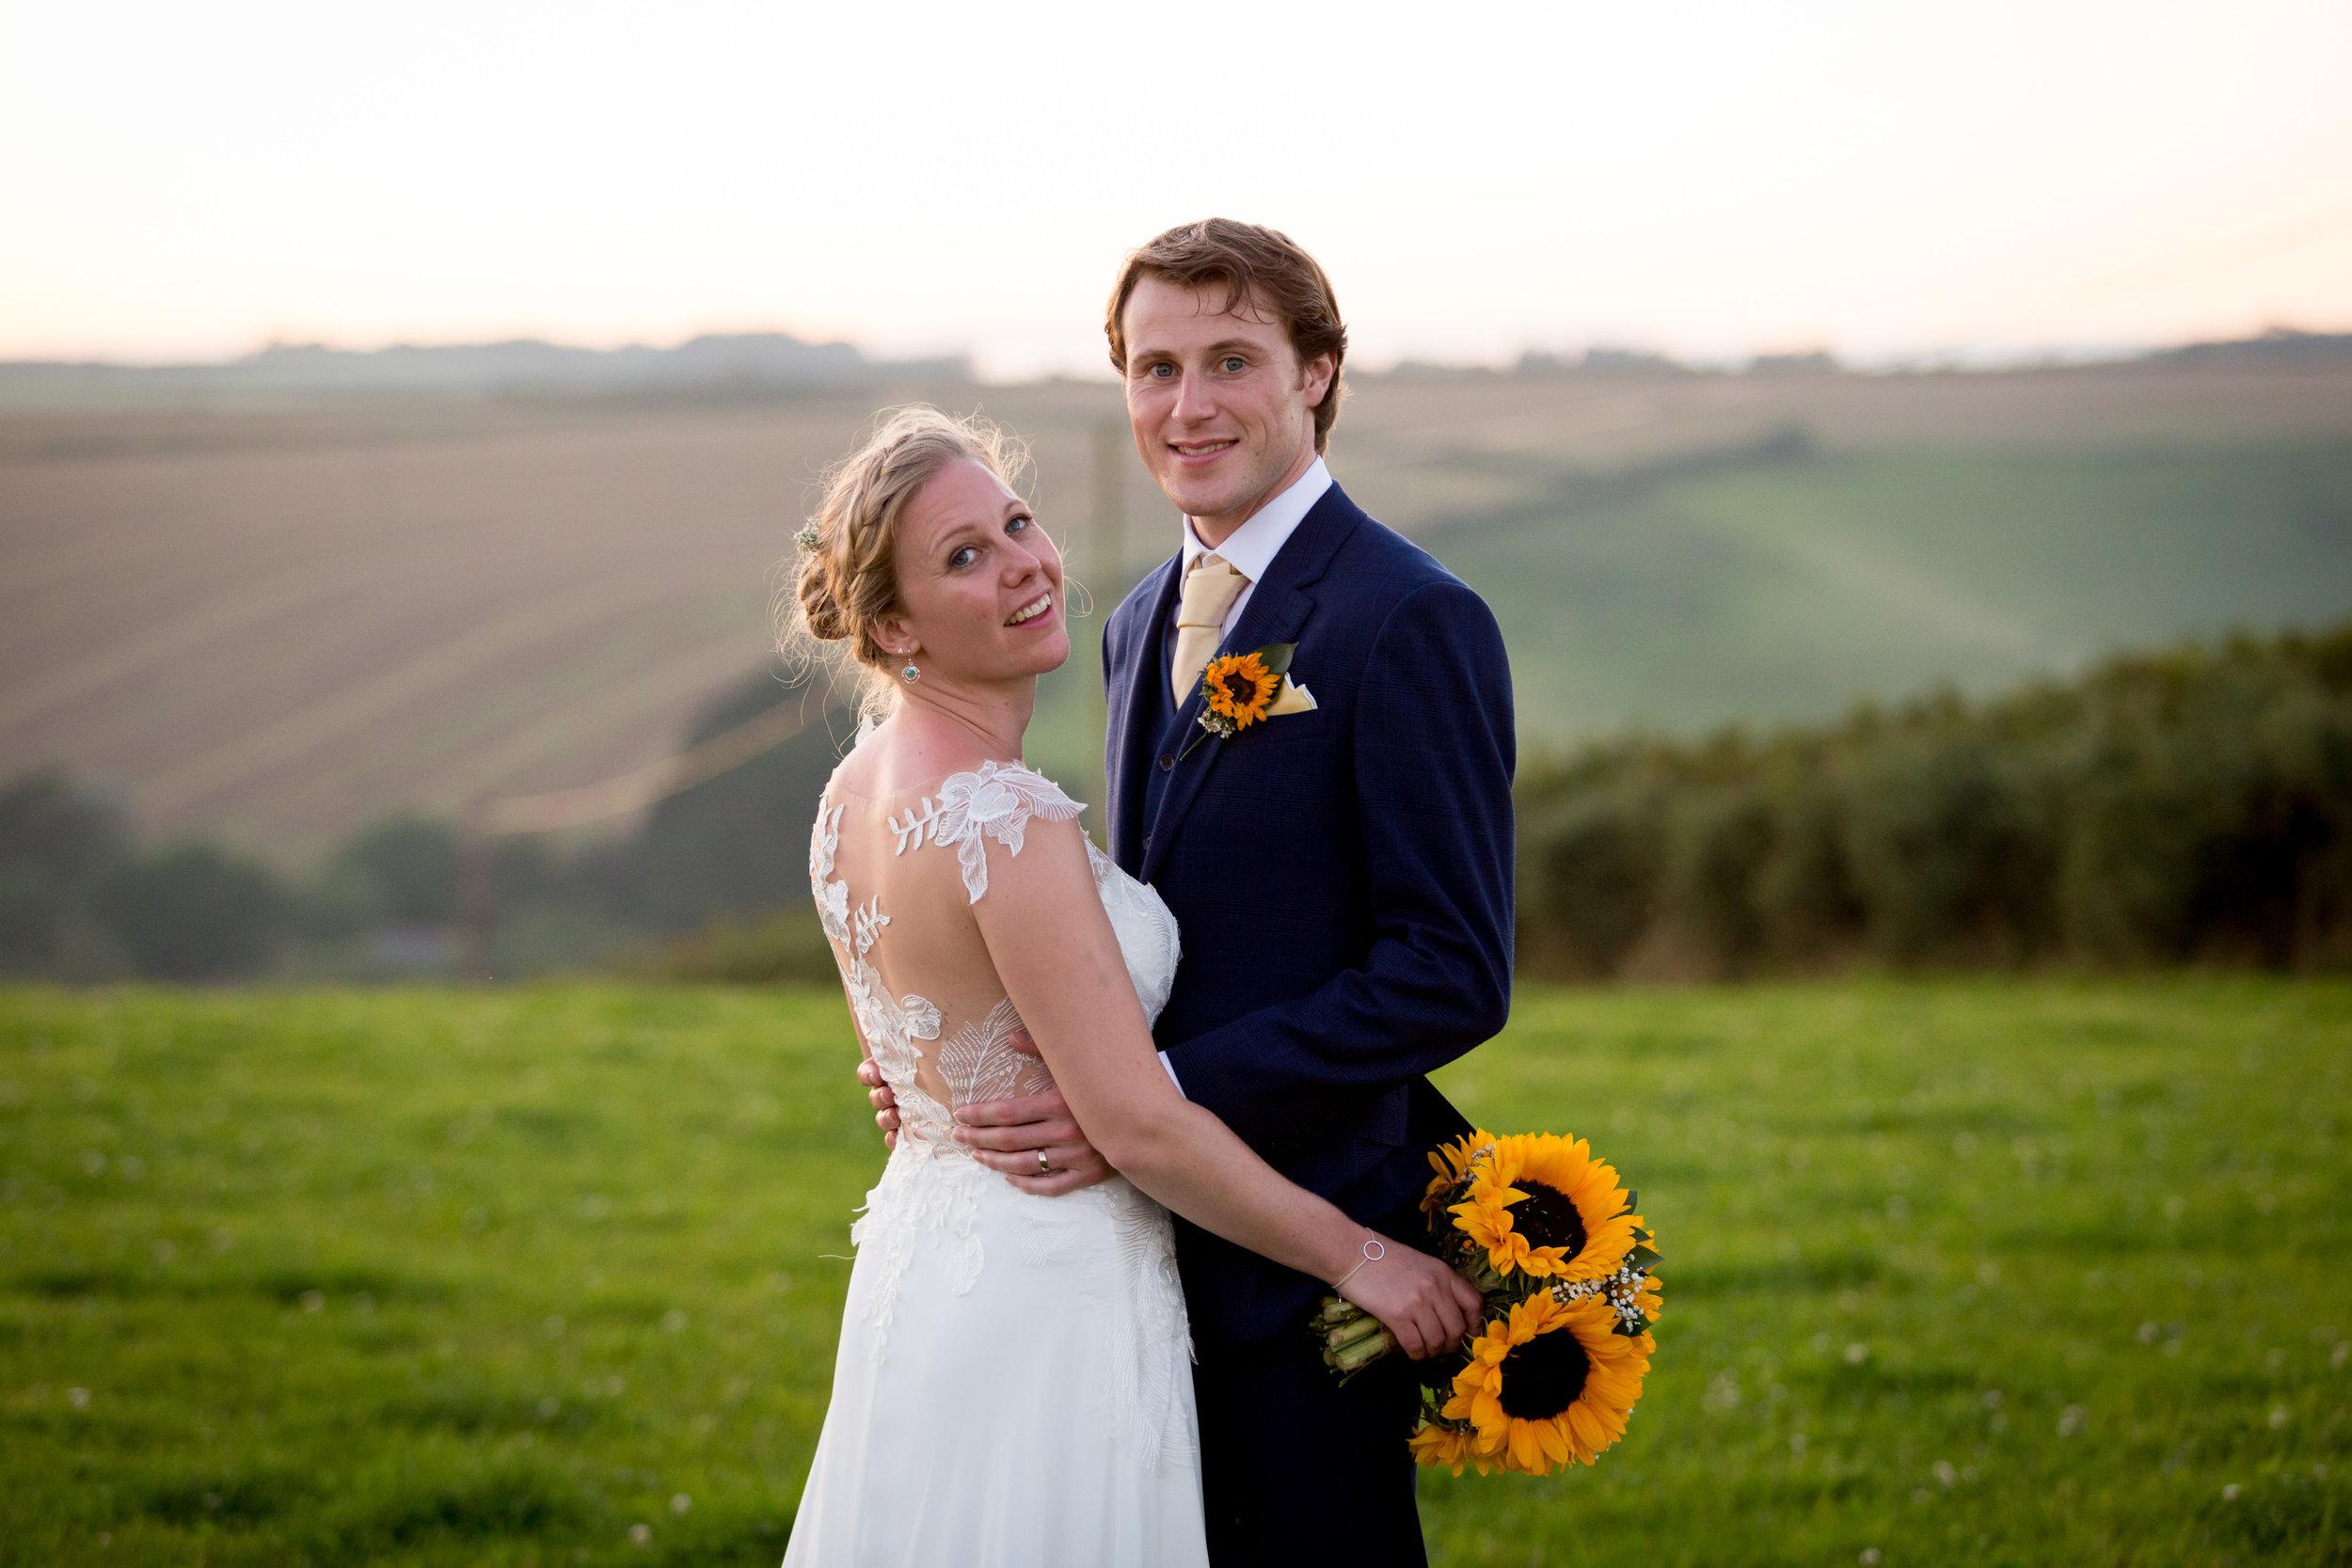 Bucklands-Tout-Saints-Hotel-Devon-Wedding-Photography-38.jpg